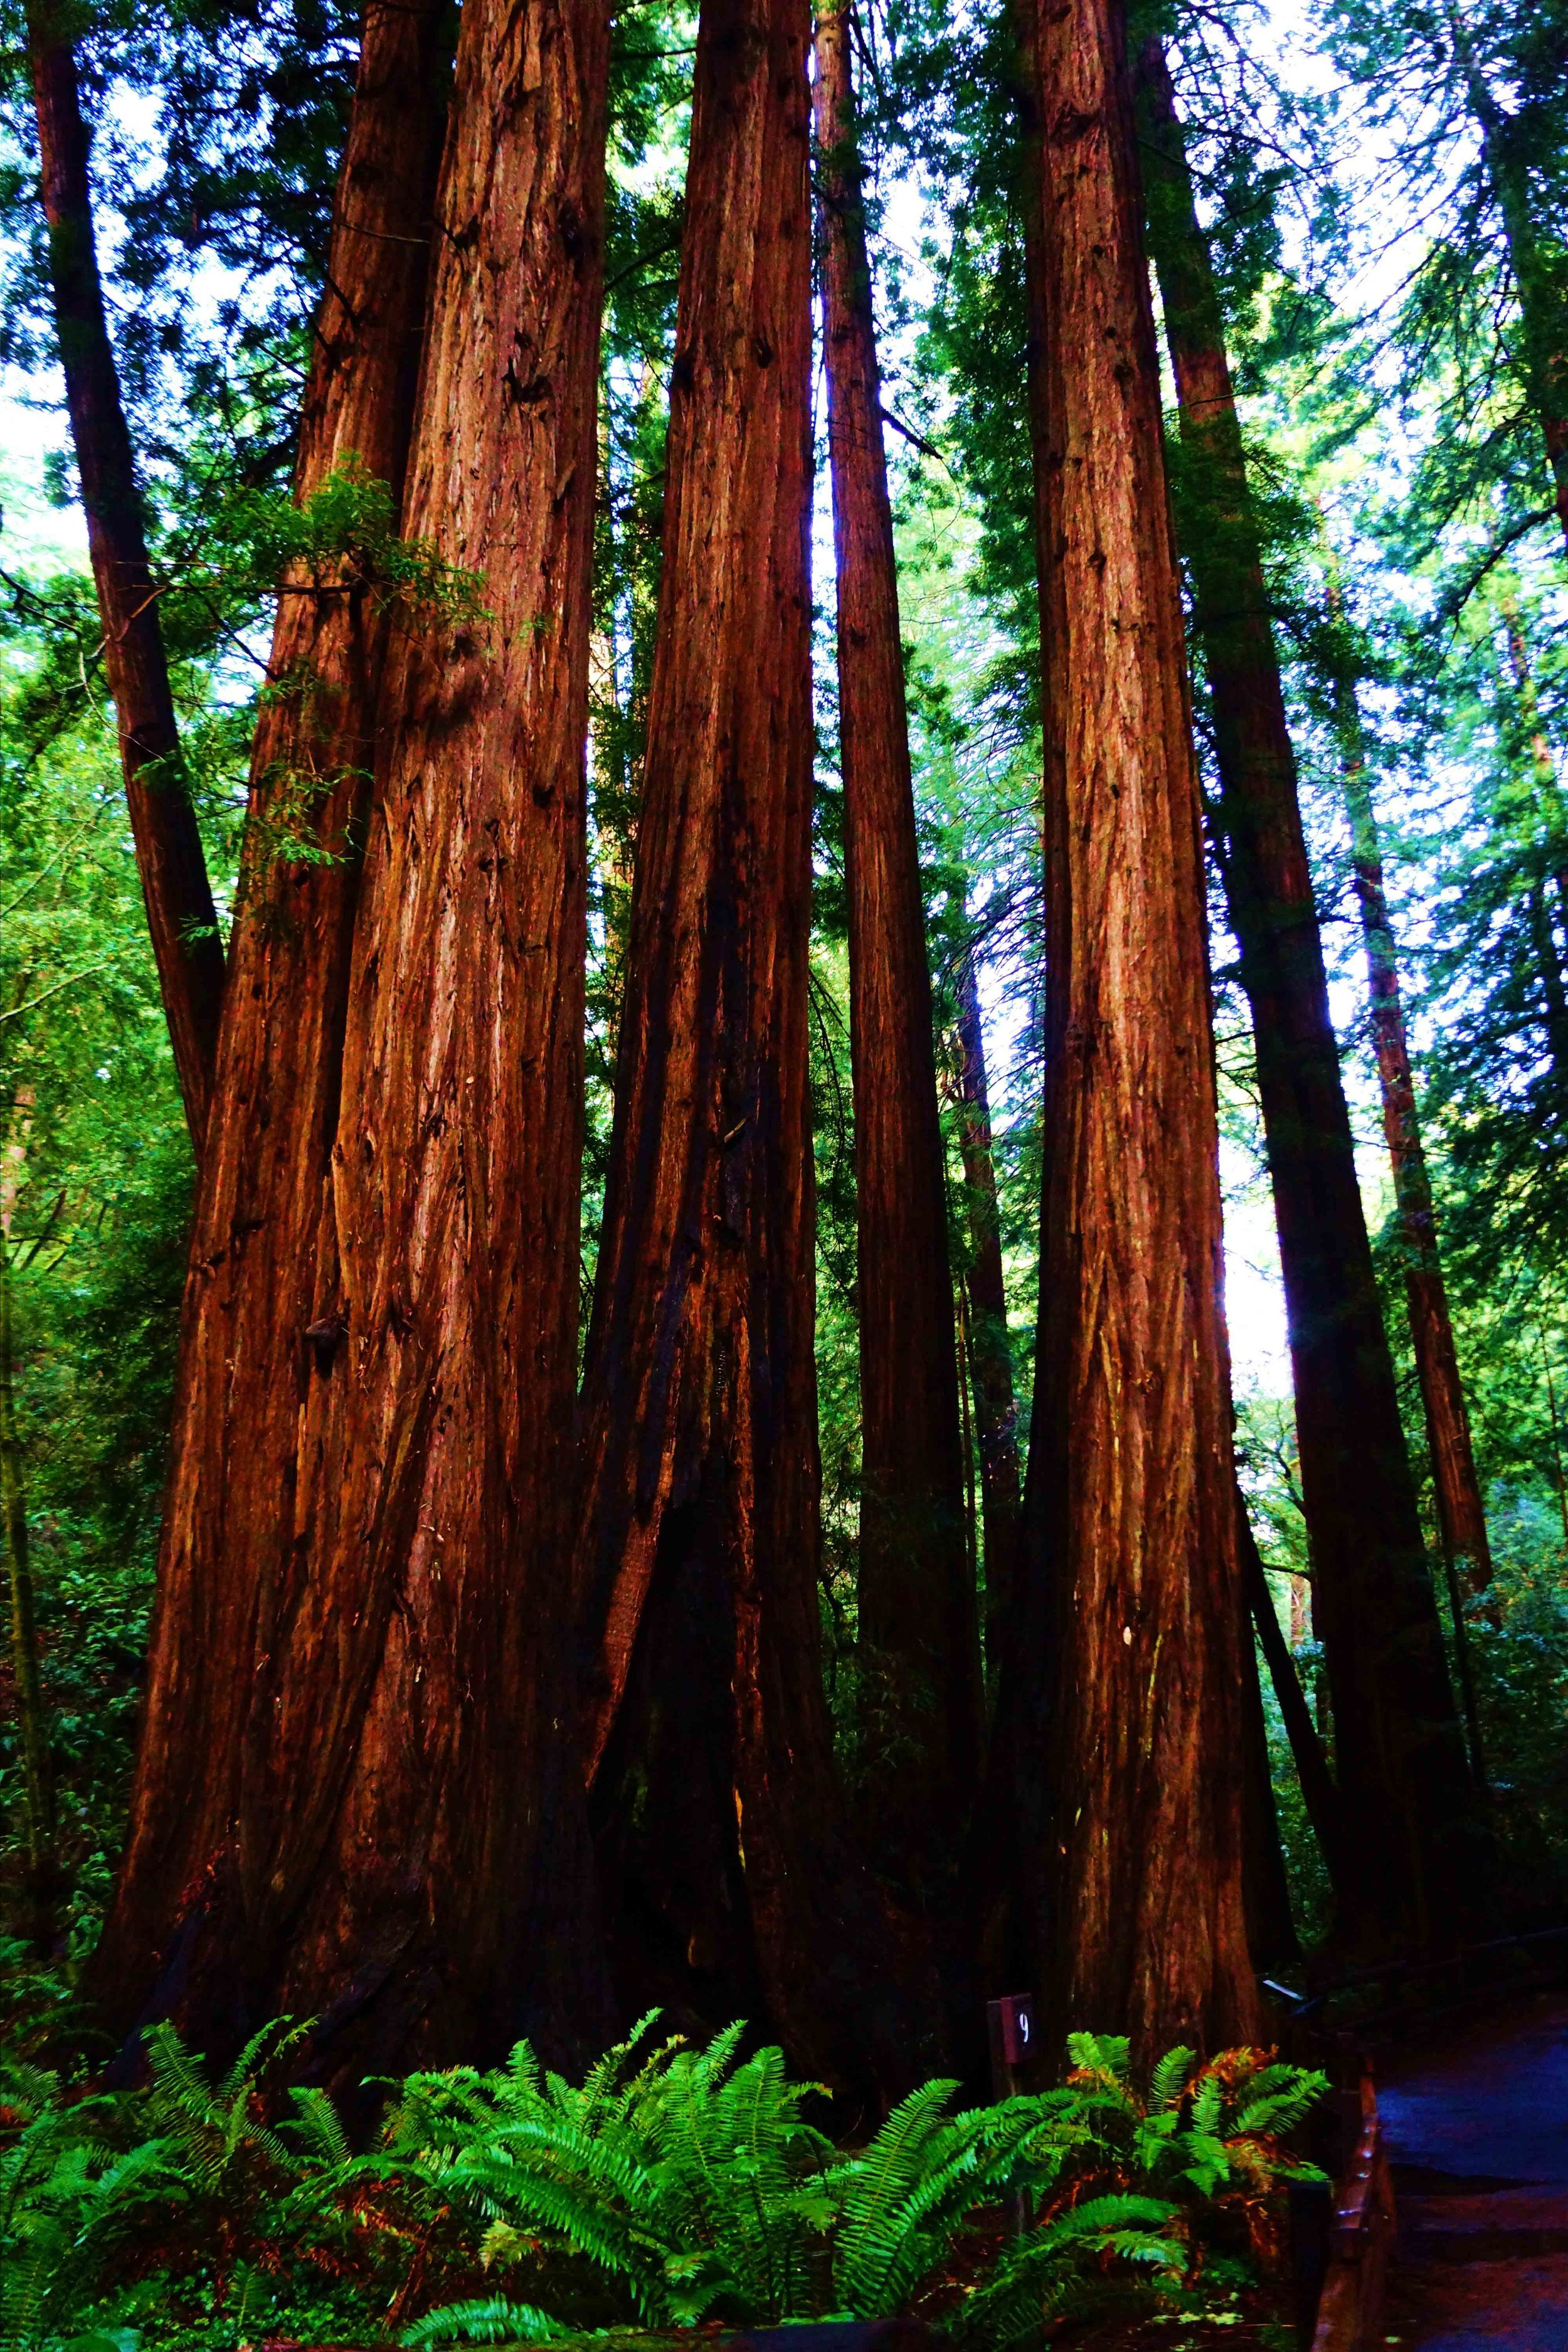 Muir Woods, California, December 2012